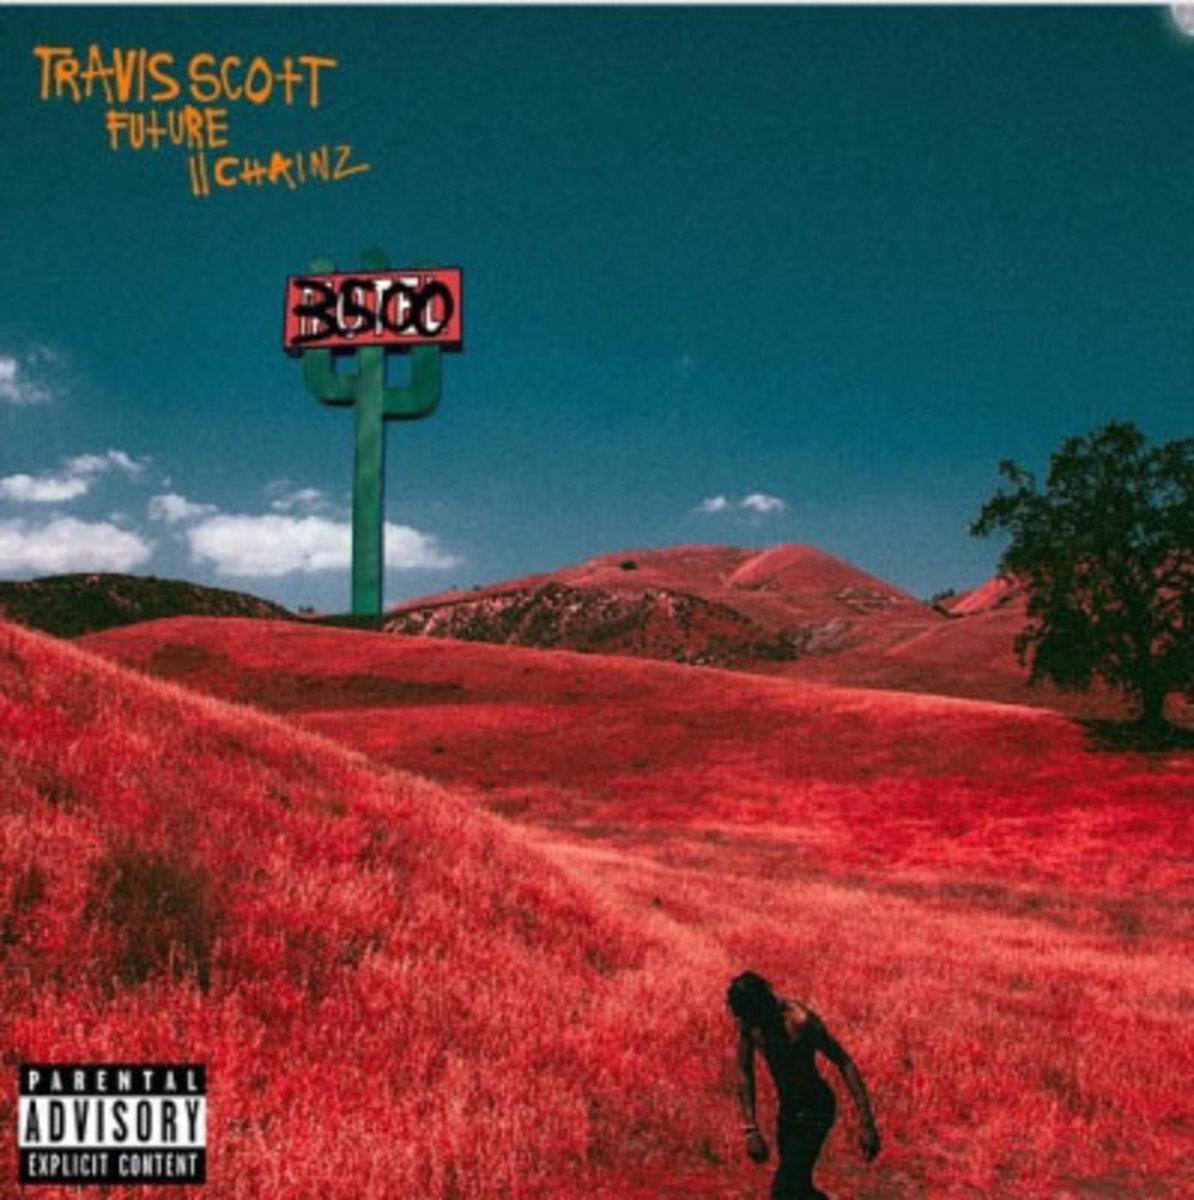 travis-scott-35001.jpg